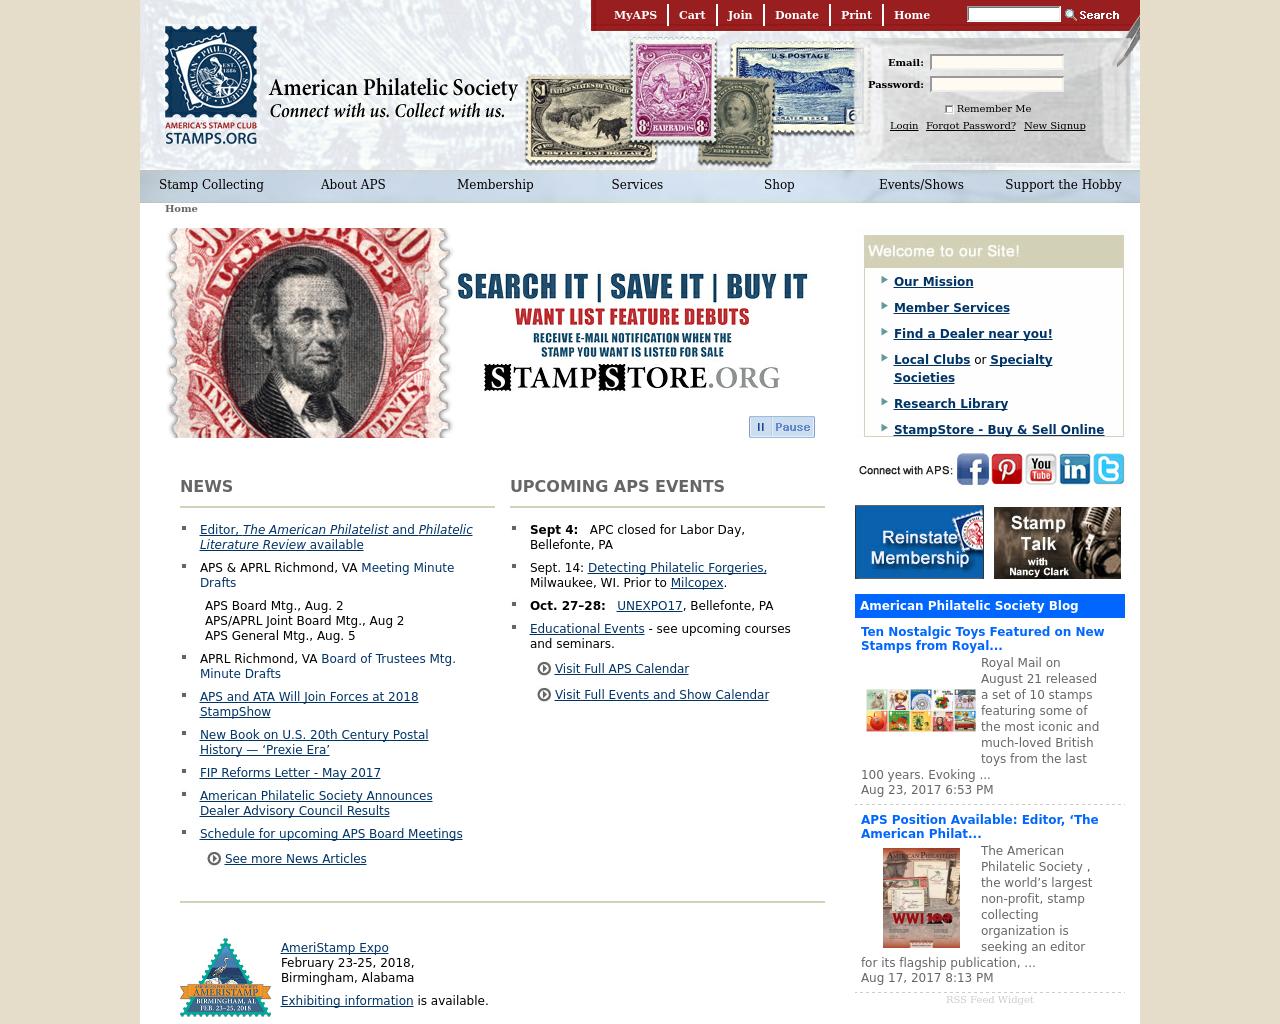 American-Philatelic-Society-Advertising-Reviews-Pricing